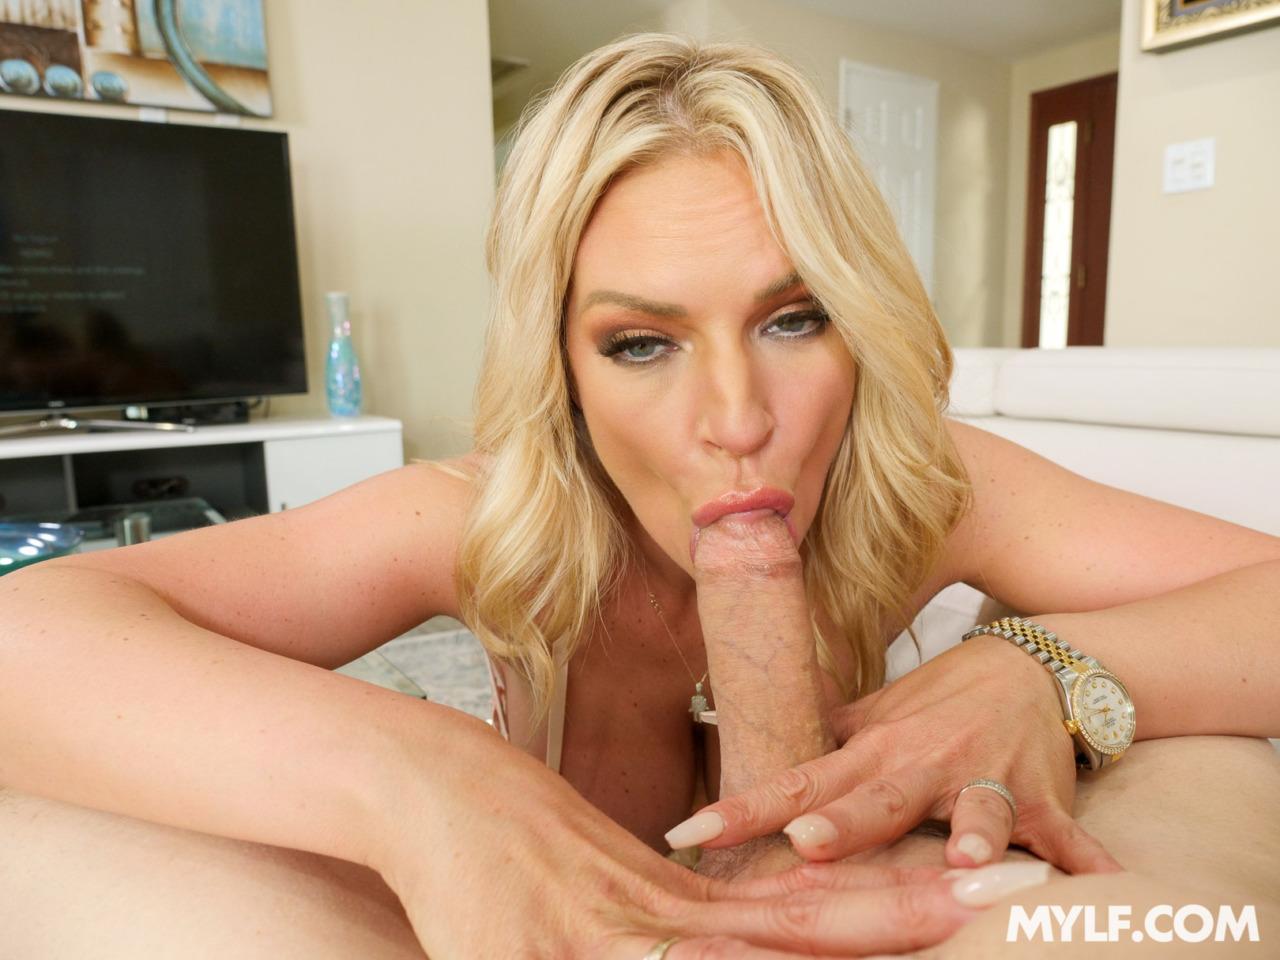 MYLF: BabeSource.com: Rachael Cavalli - 6